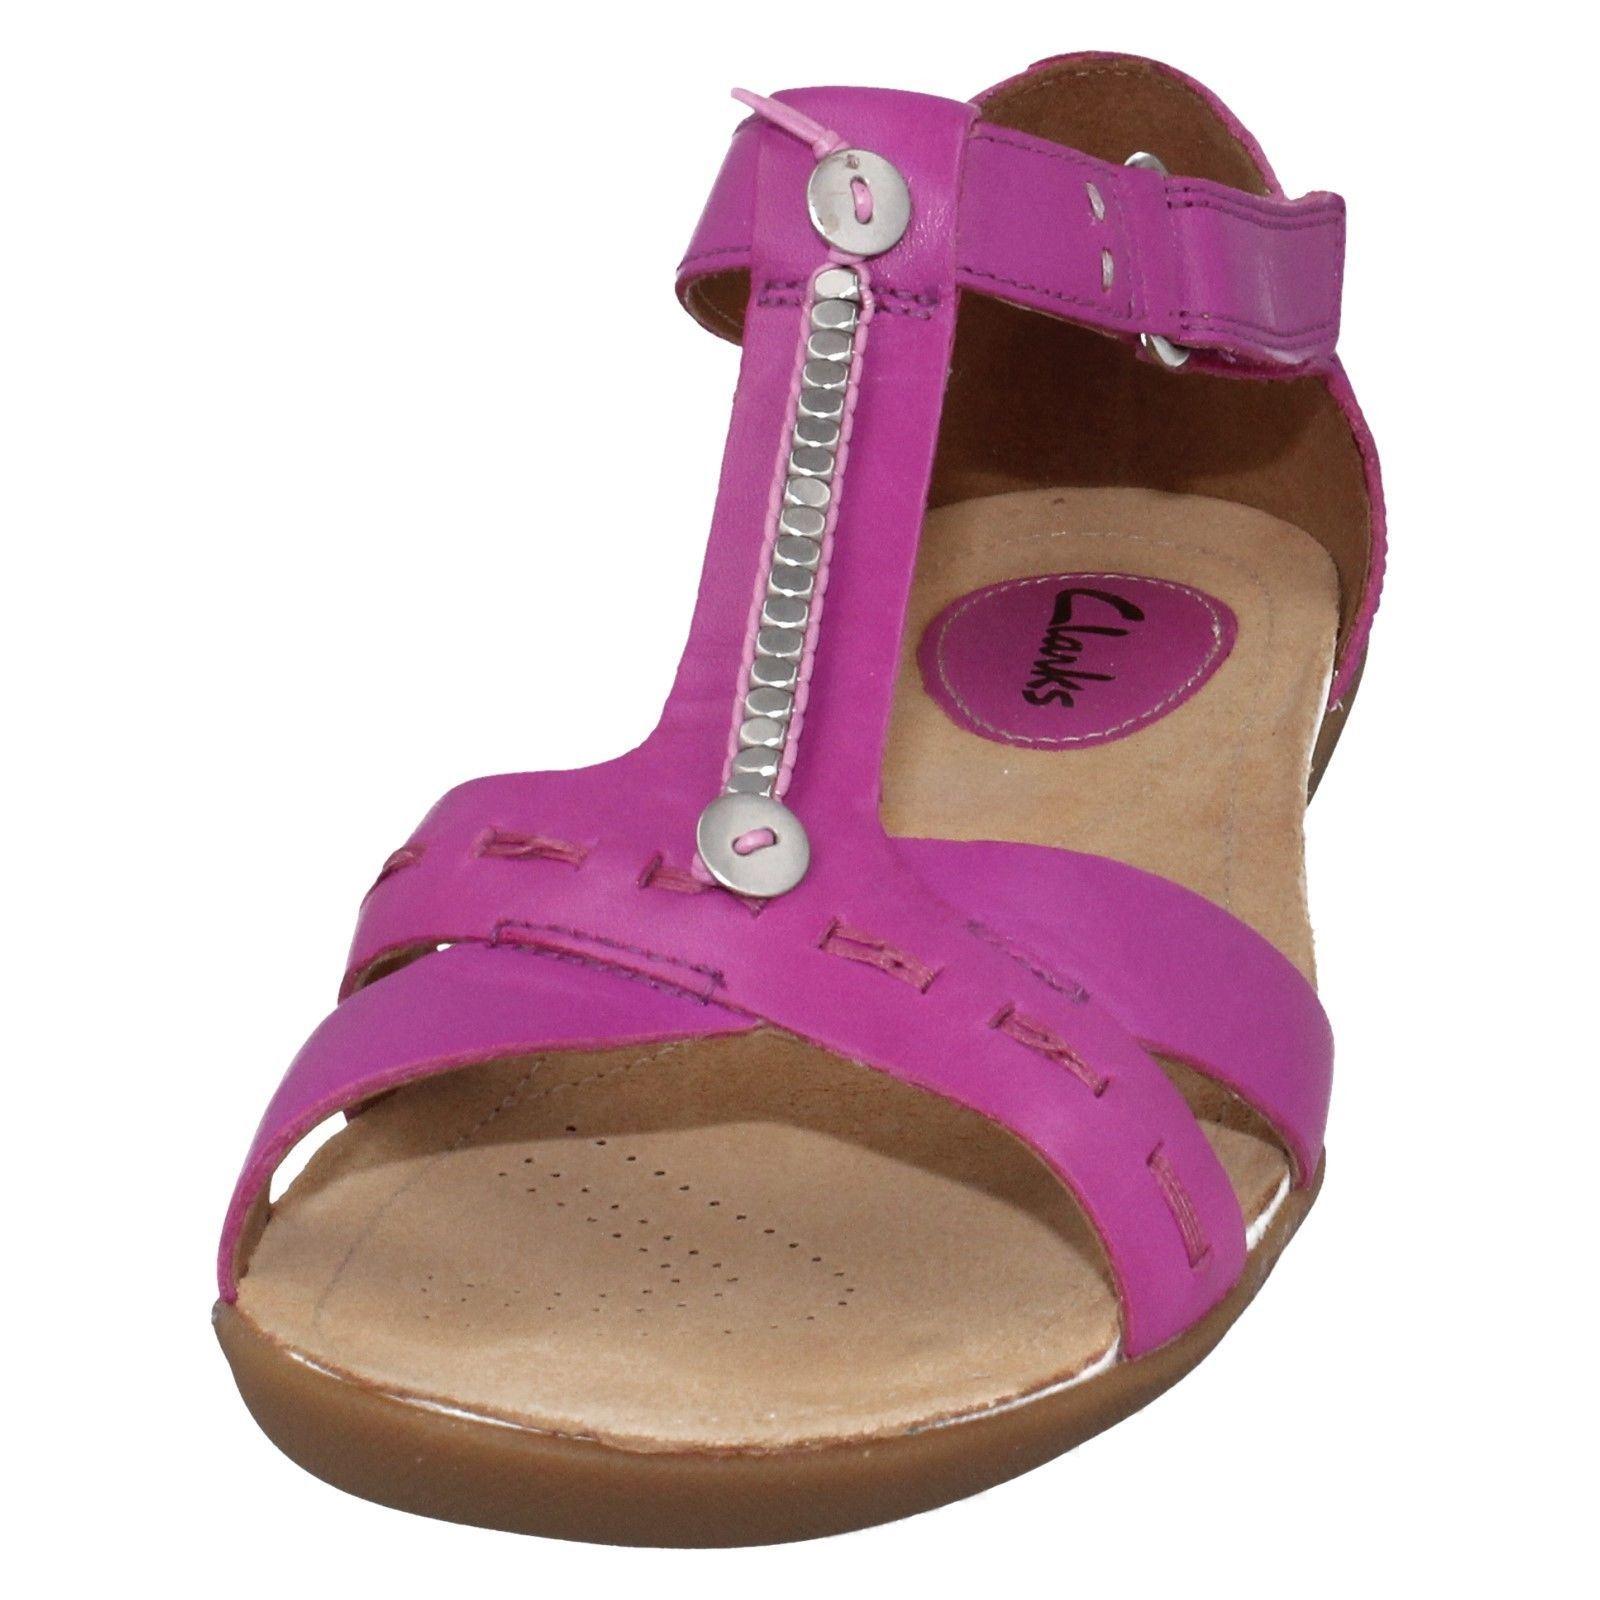 Sandalo Casual Donna Clarks in Pelle Casual Sandalo Sandalo Gladiatore Raffi Raffi   4520ce